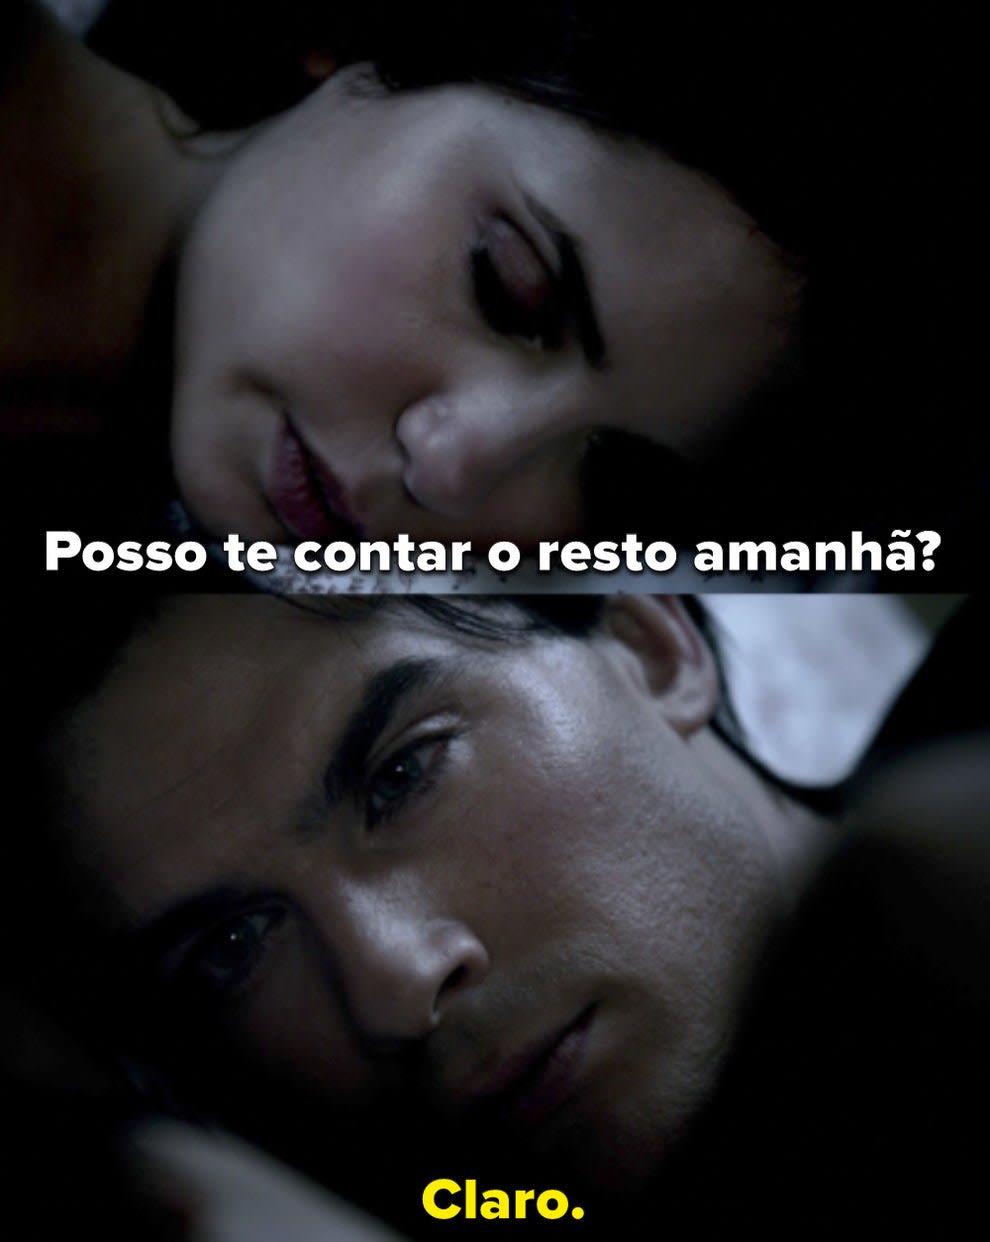 Elena pergunta à Damon se ela pode contar o resto no dia seguinte e Damon diz que sim.